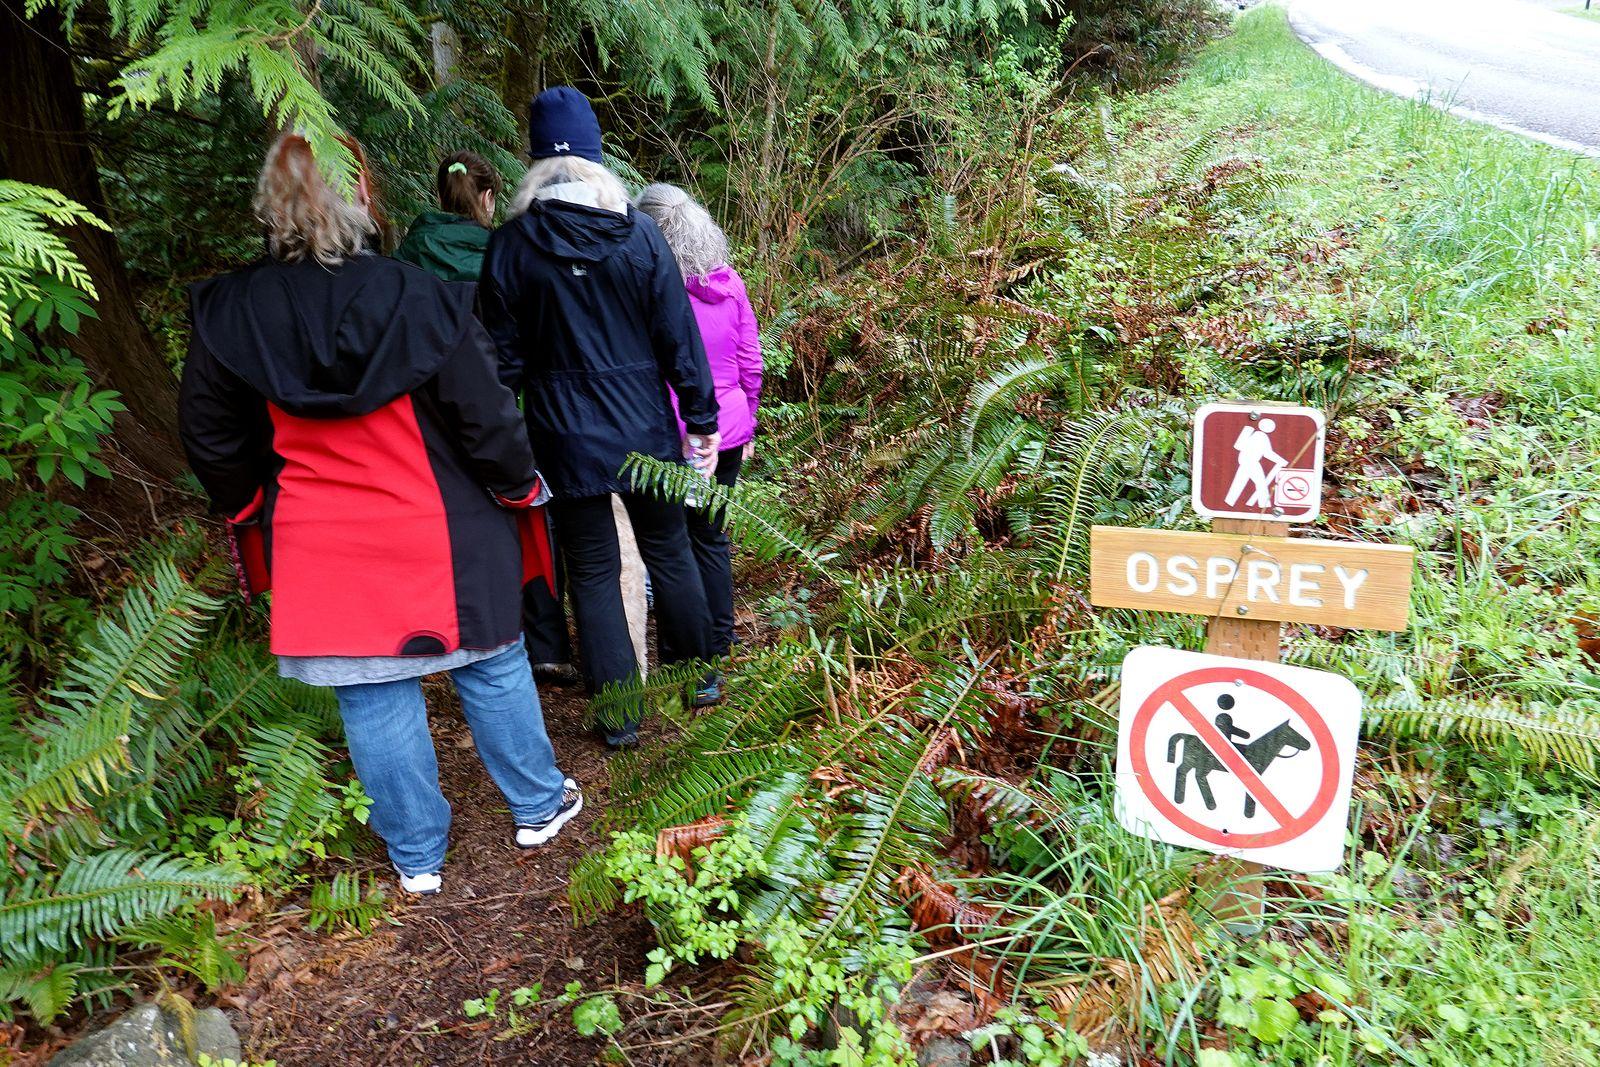 Down the Osprey Trail